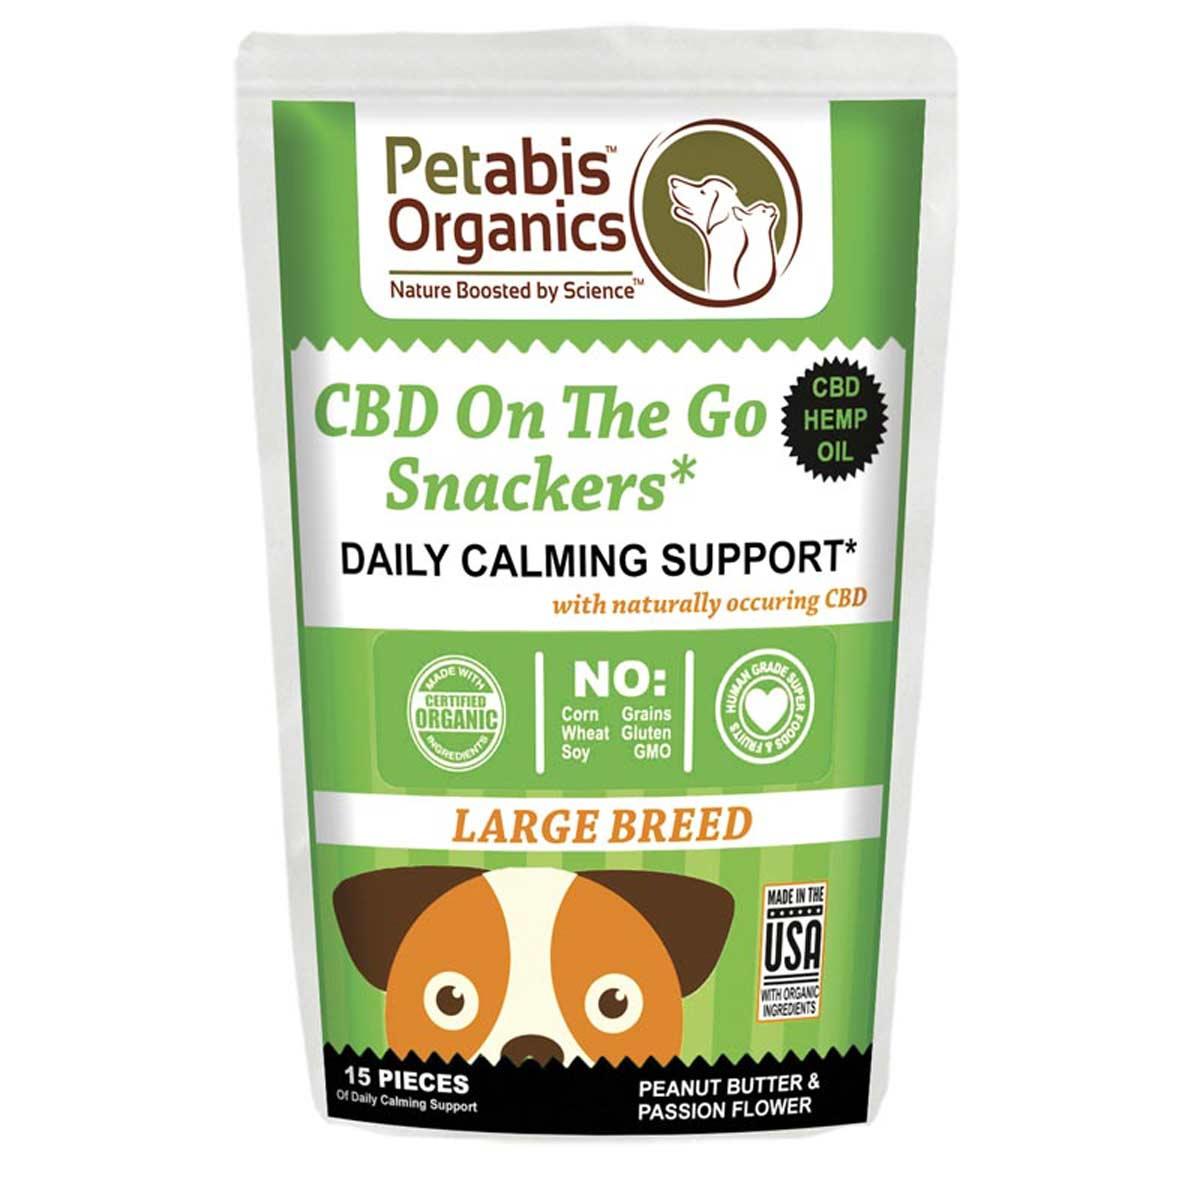 Petabis Organics Daily Calming Snacker Large Breed 5 mg 15 Count CBD Dog Treats